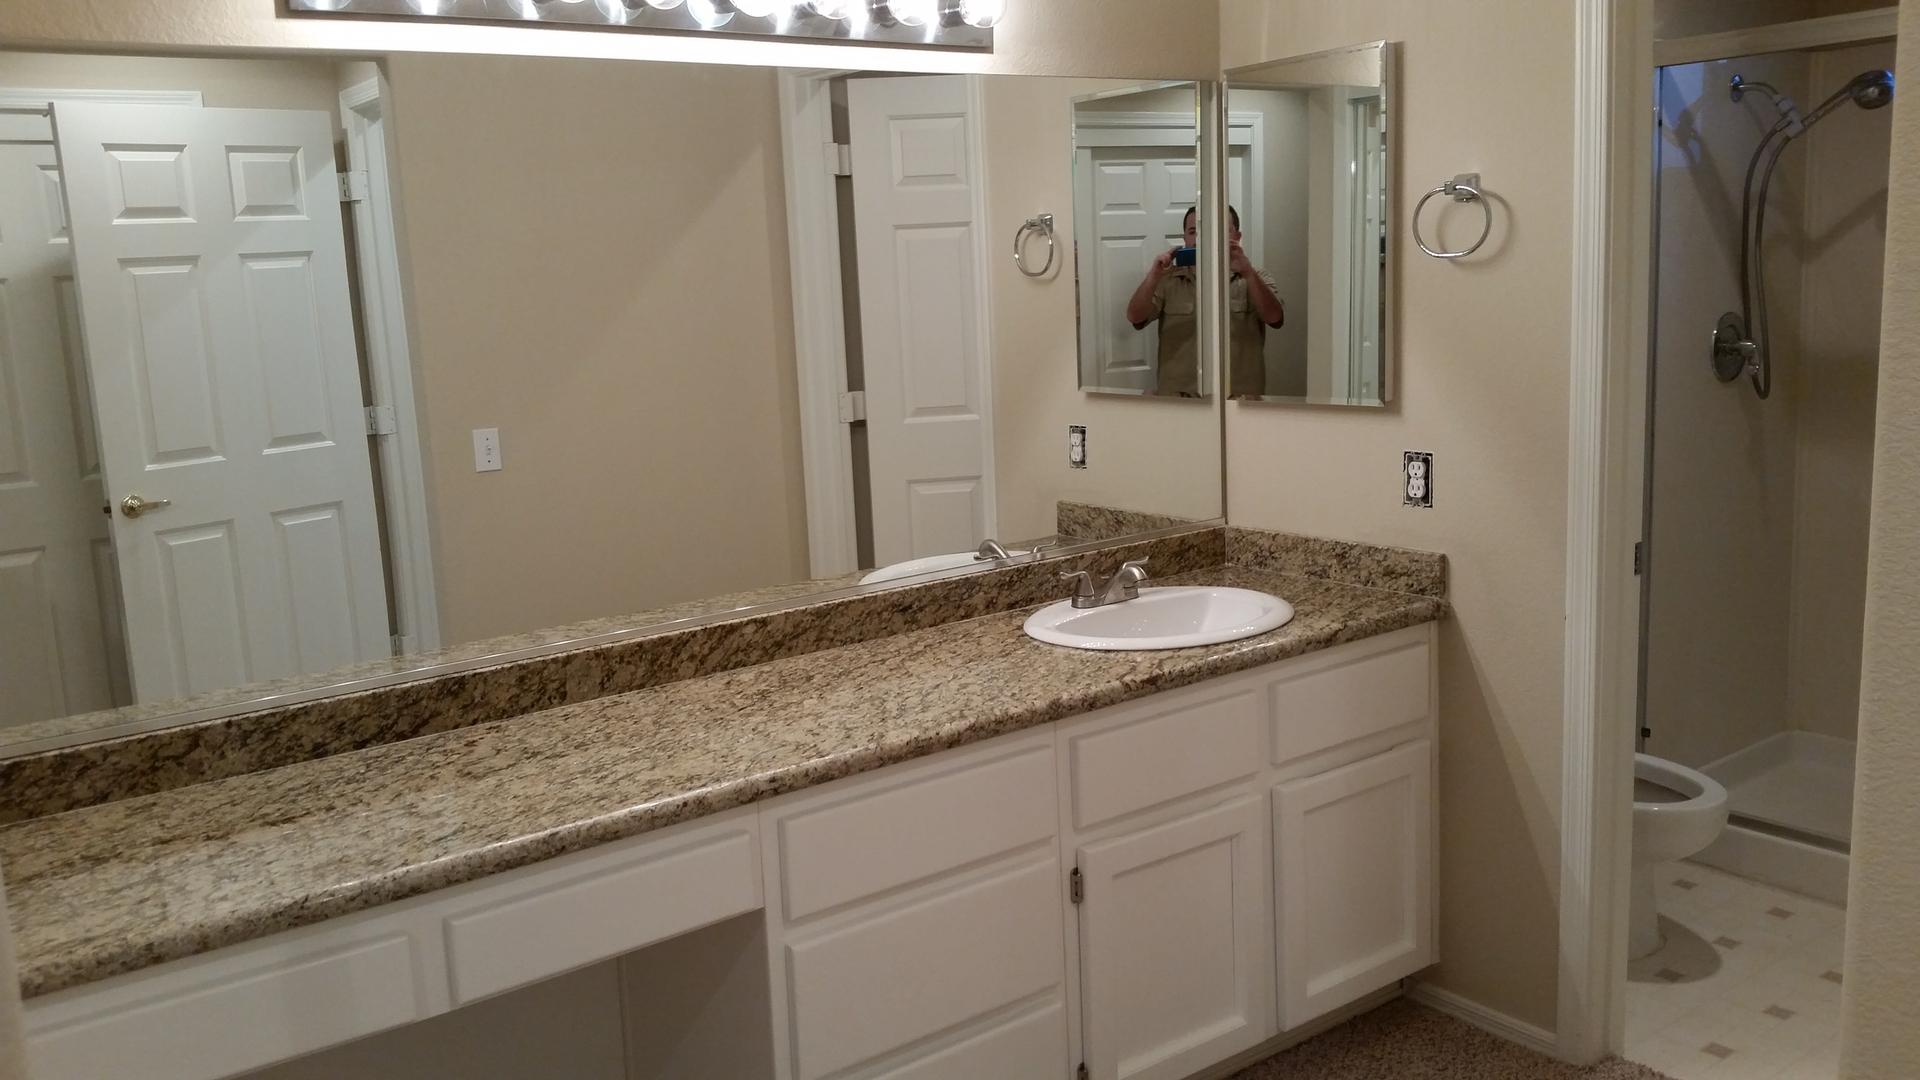 Kitchen & Bathroom Remodel Flood Remediation First Source